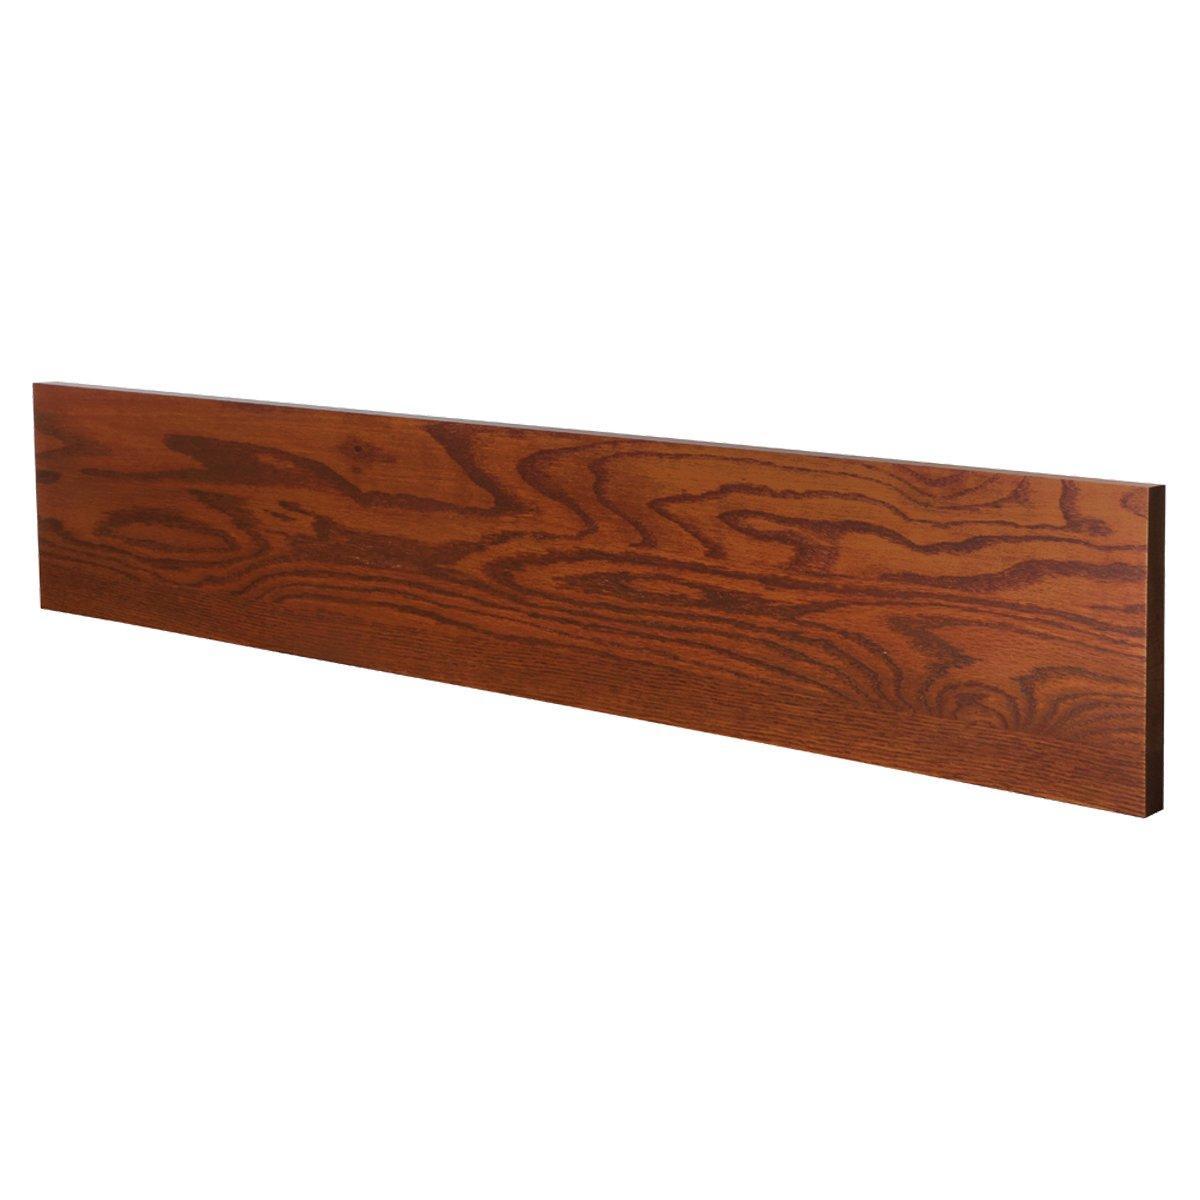 TreadWell Cognac Oak Stair Riser